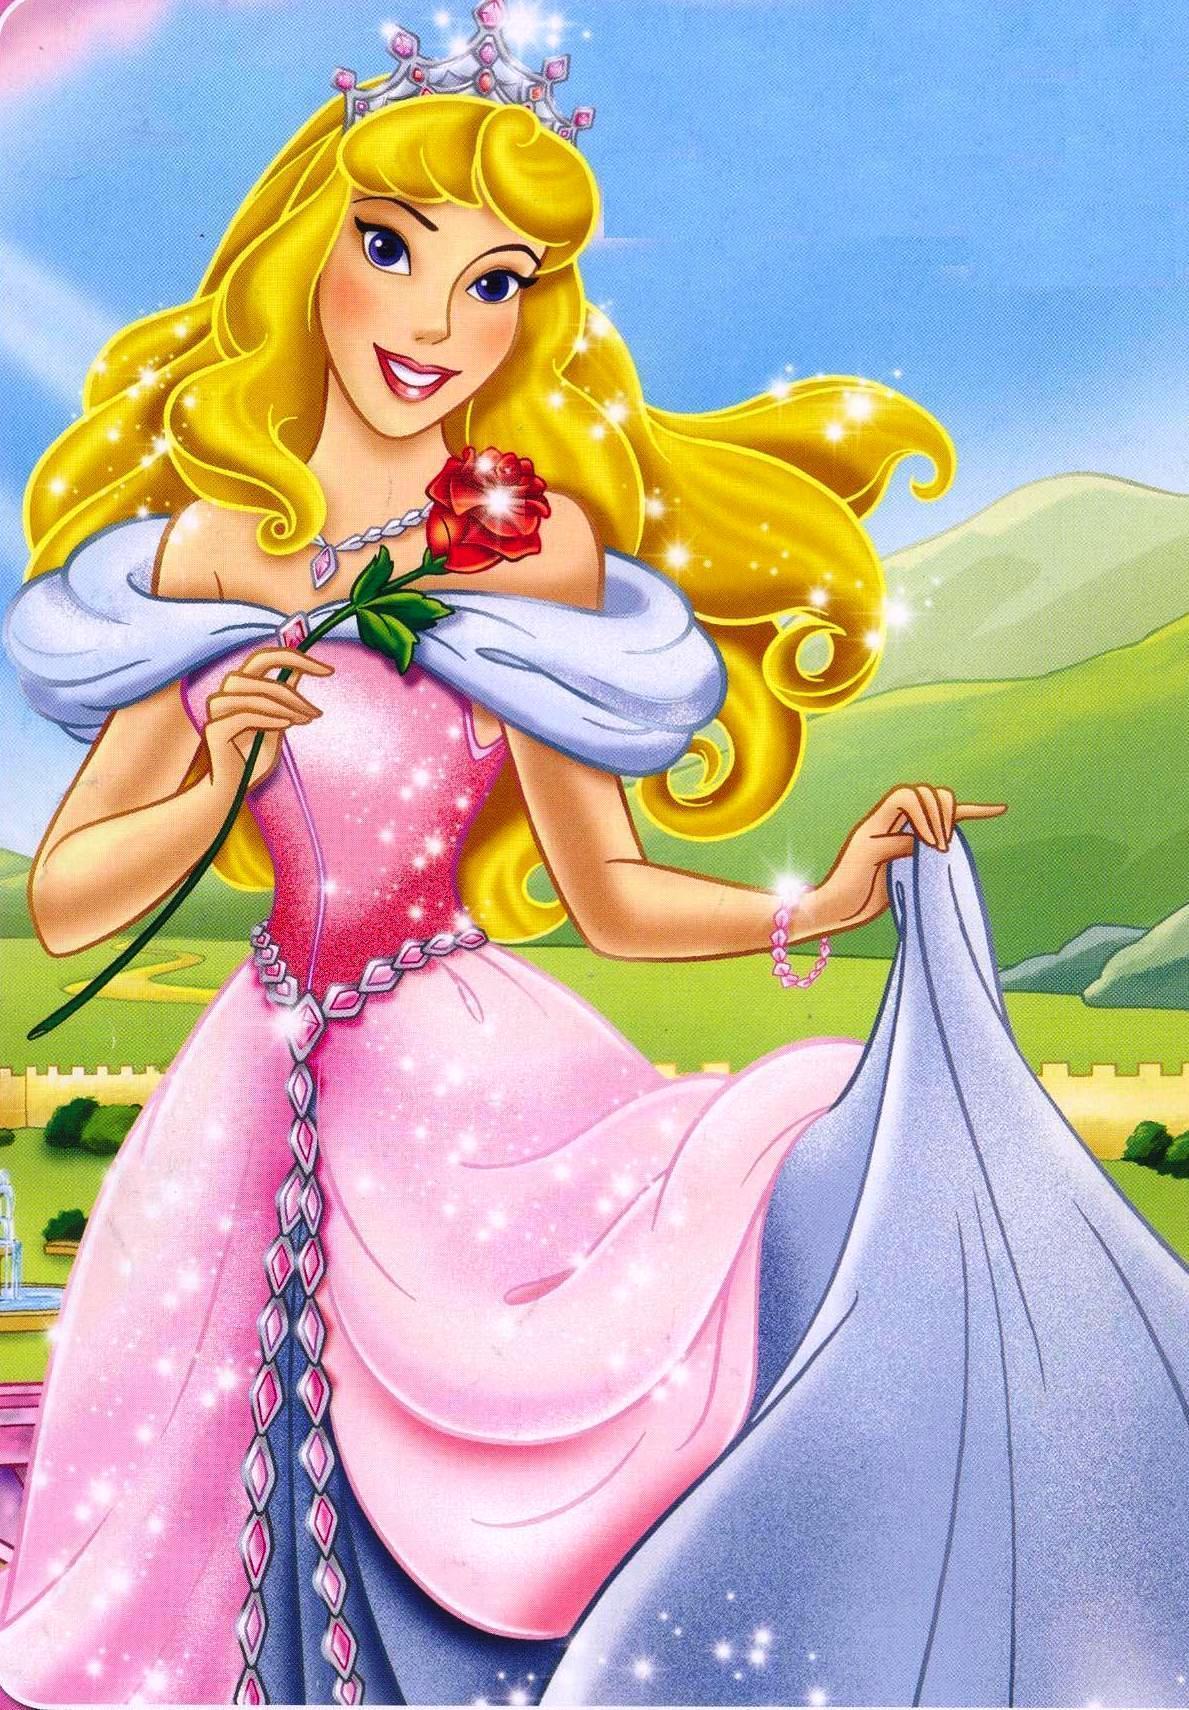 أميرات ديزنى رائعة Princess-Aurora-disney-princess-6332949-1189-1710